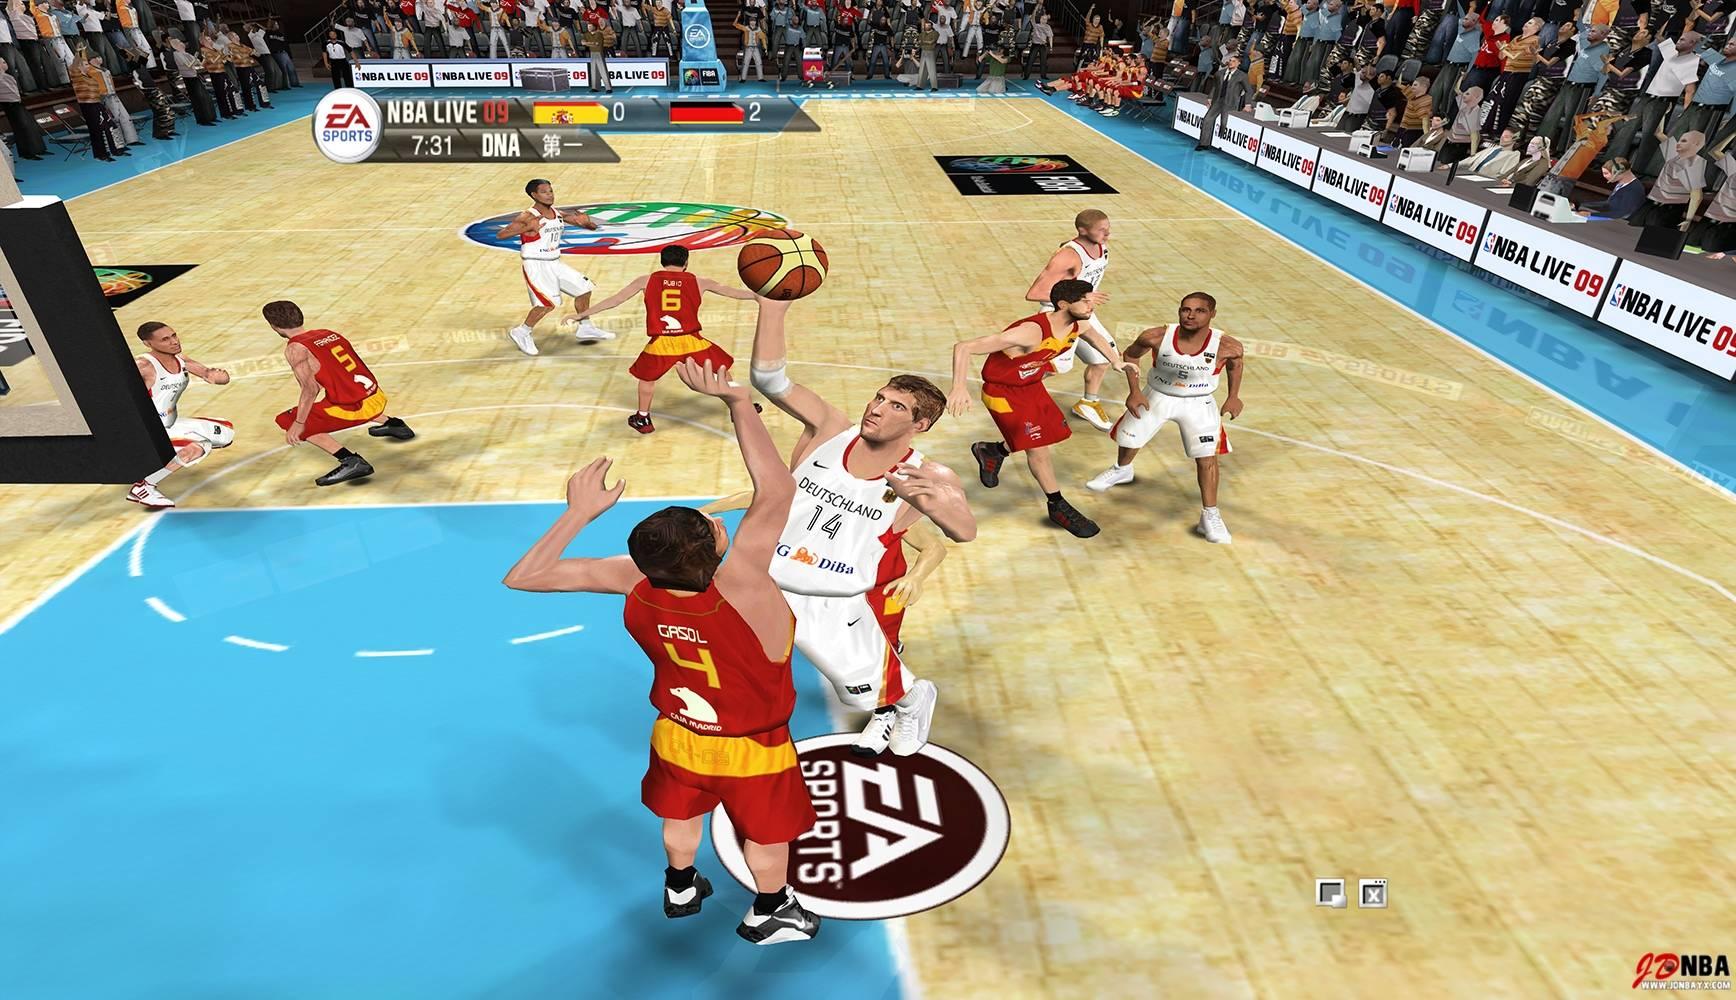 NBA LIVE 09【4K】-2021-08-26-02-29-01-060副本.jpg